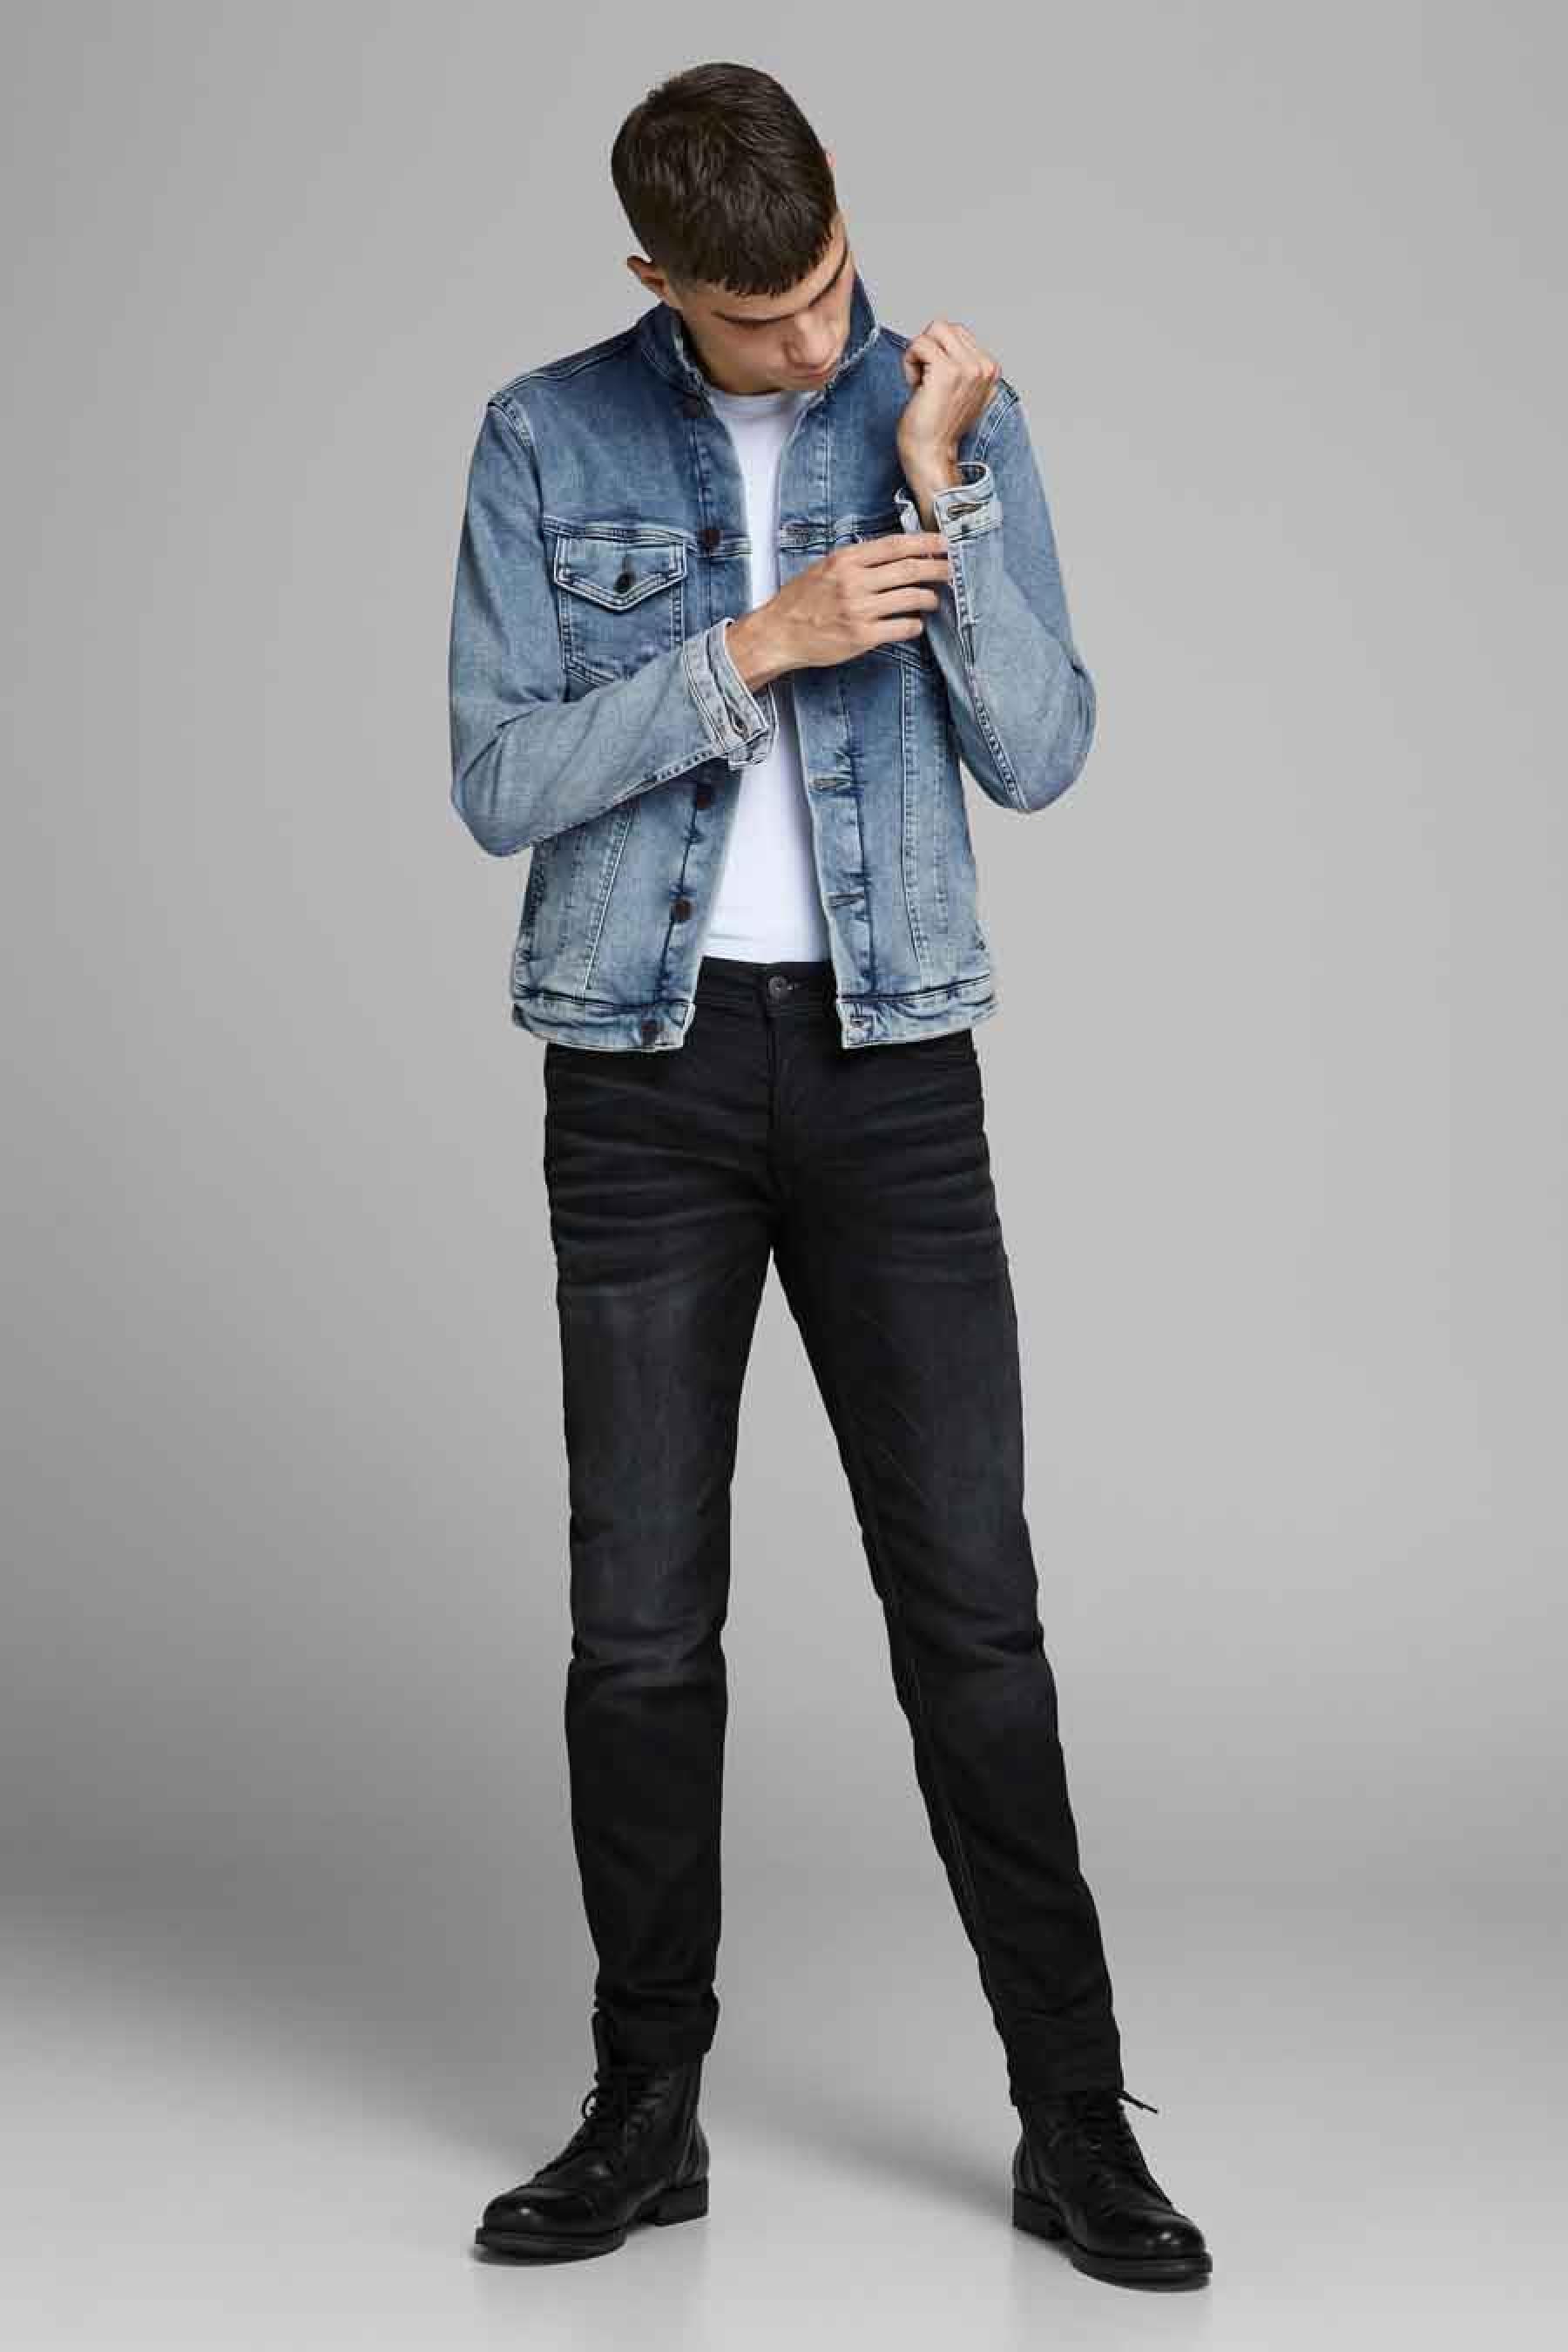 Jack & Jones Jeans Intelligenc Jas kort, Denim, Heren, Maat: L/M/S/XL